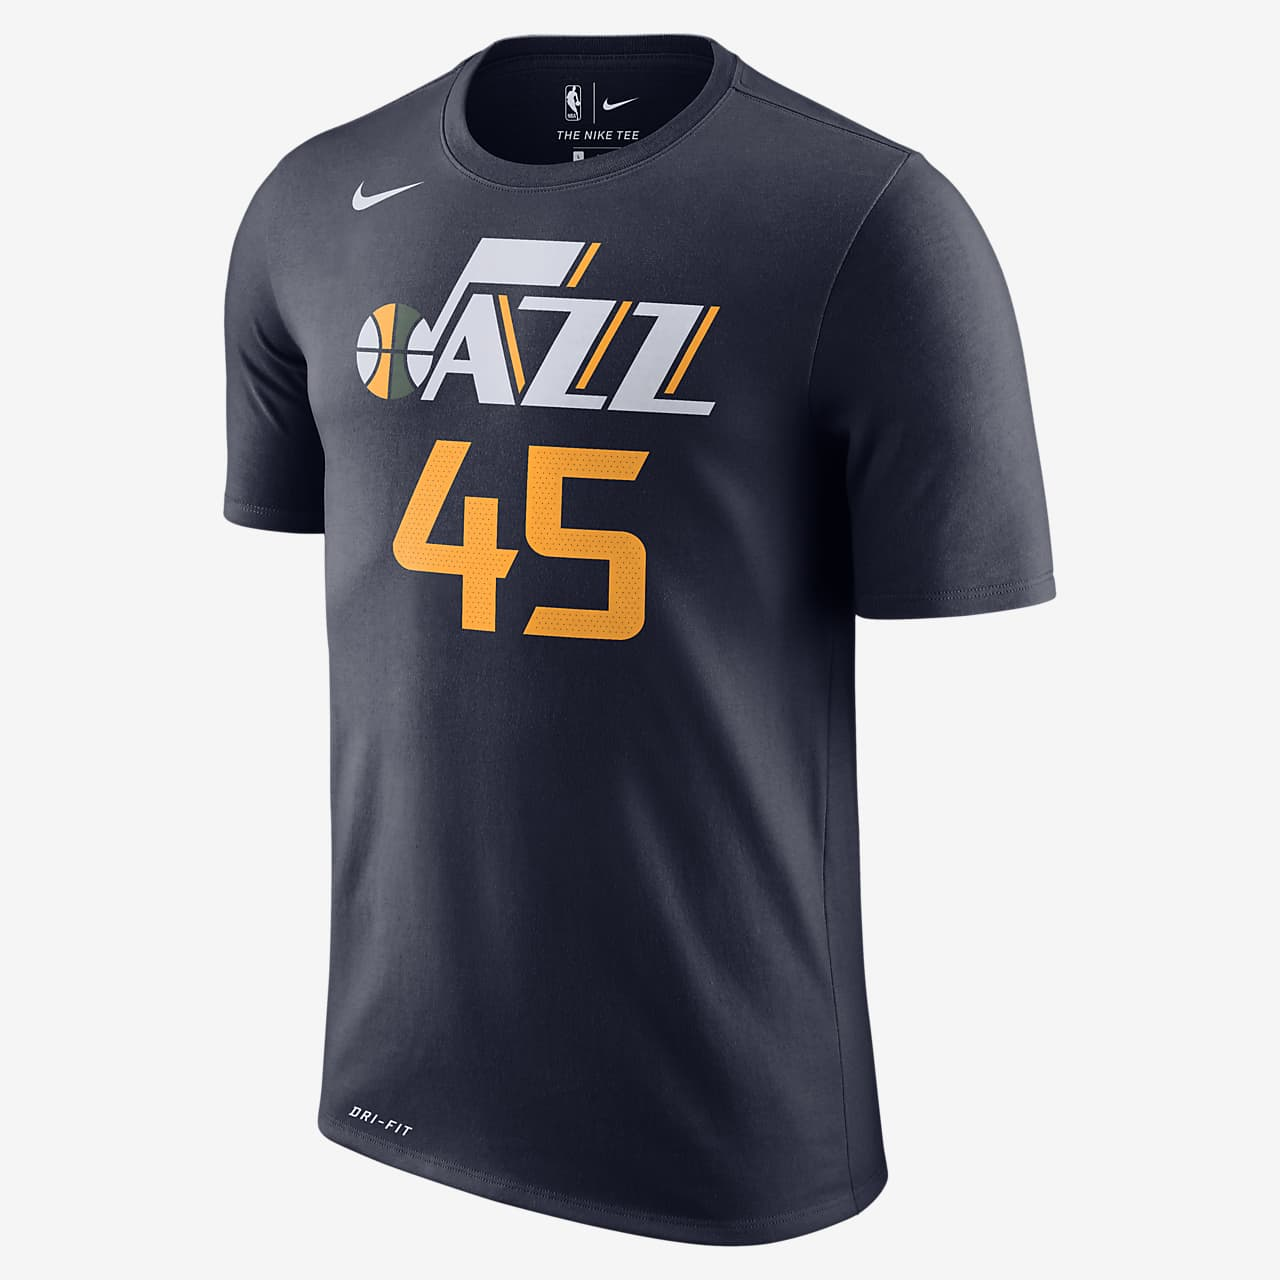 Donovan Mitchell Utah Jazz Nike Dri-FIT Men's NBA T-Shirt